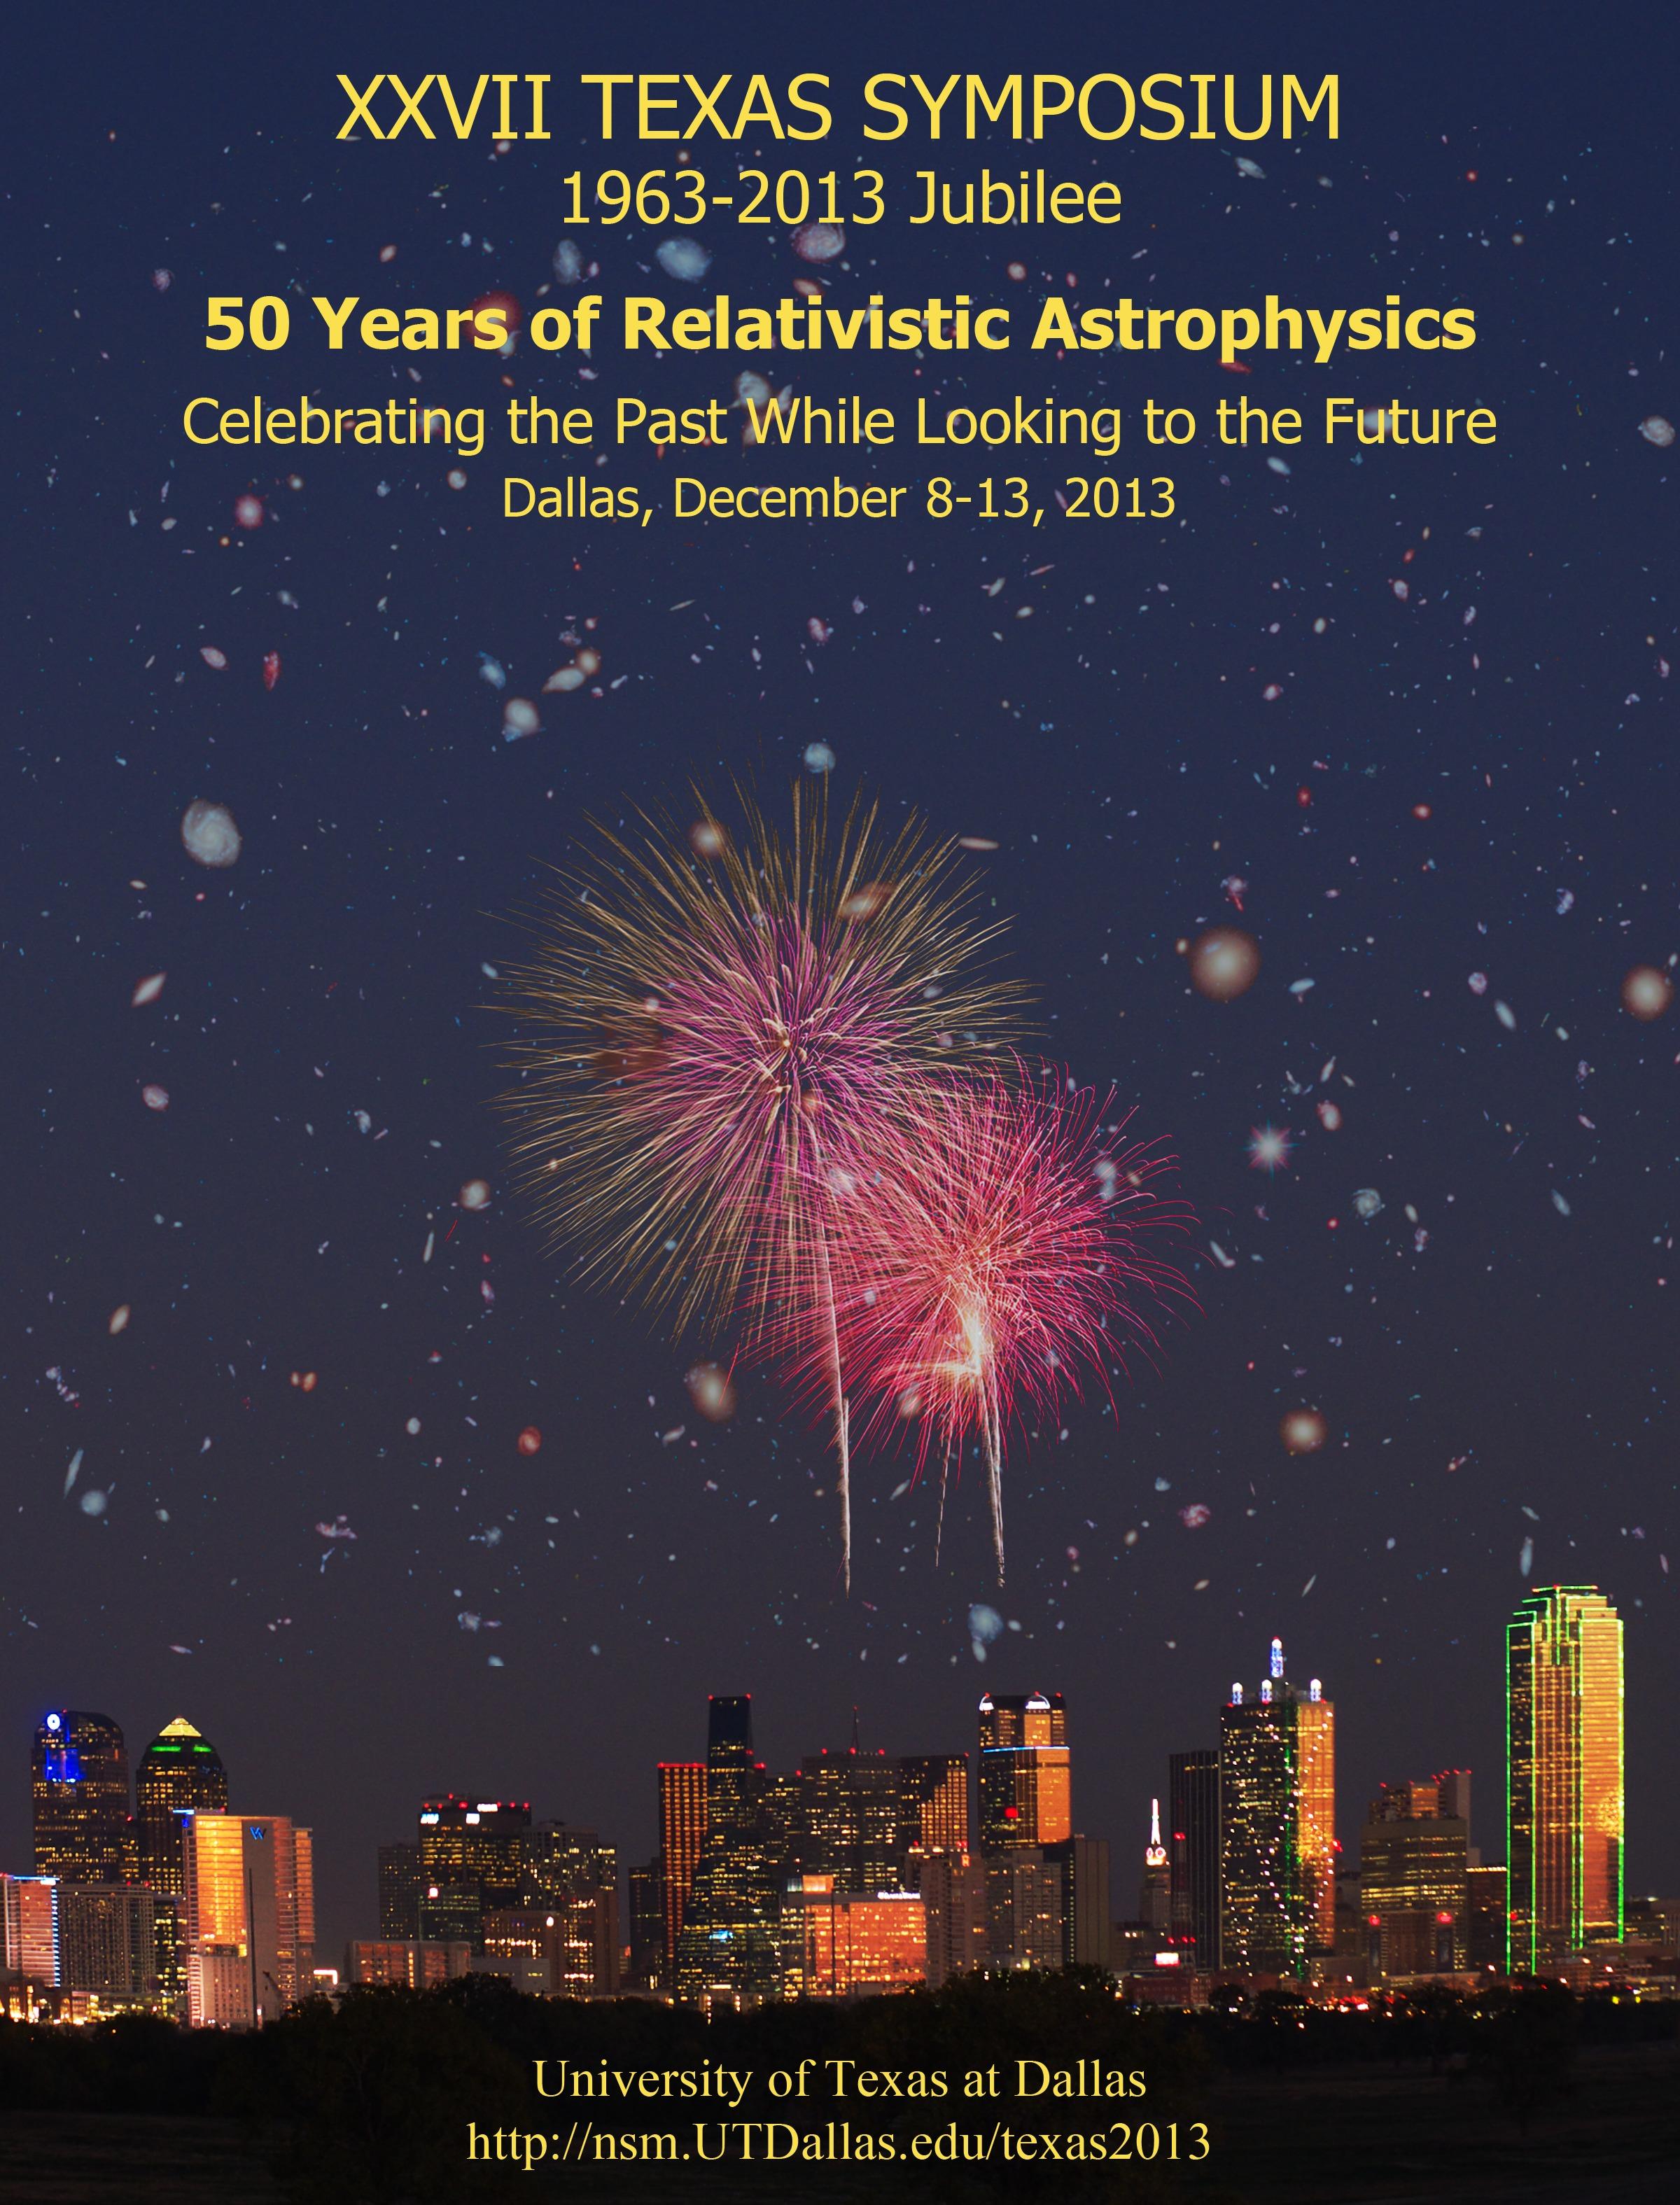 Symposium Poster. Credit: Larry Ammann